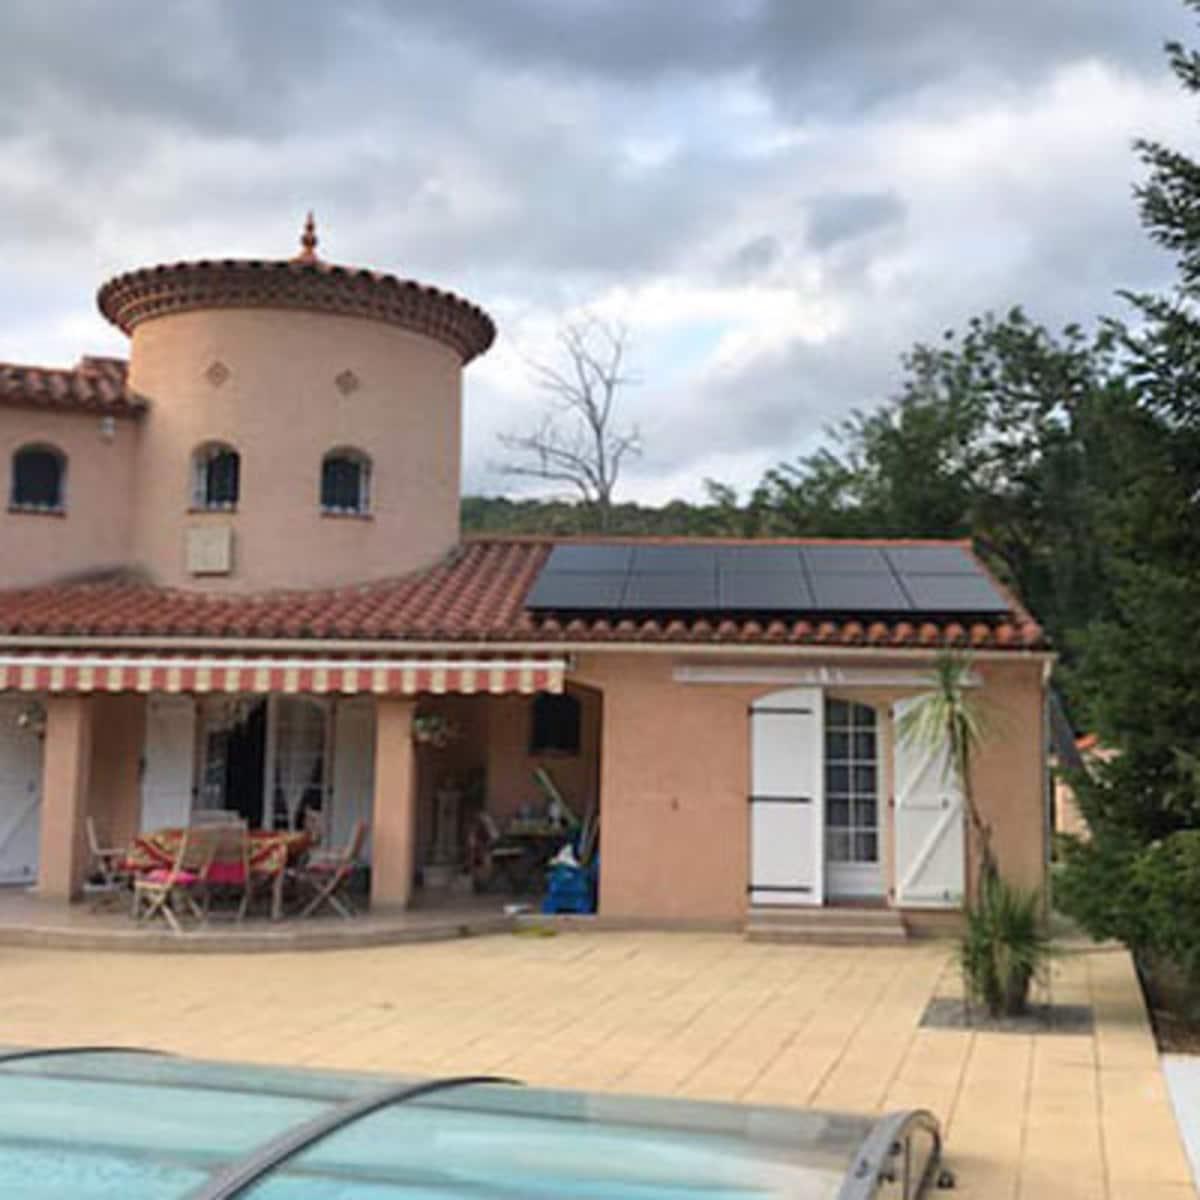 Panneaux solaires Ambiance Energie